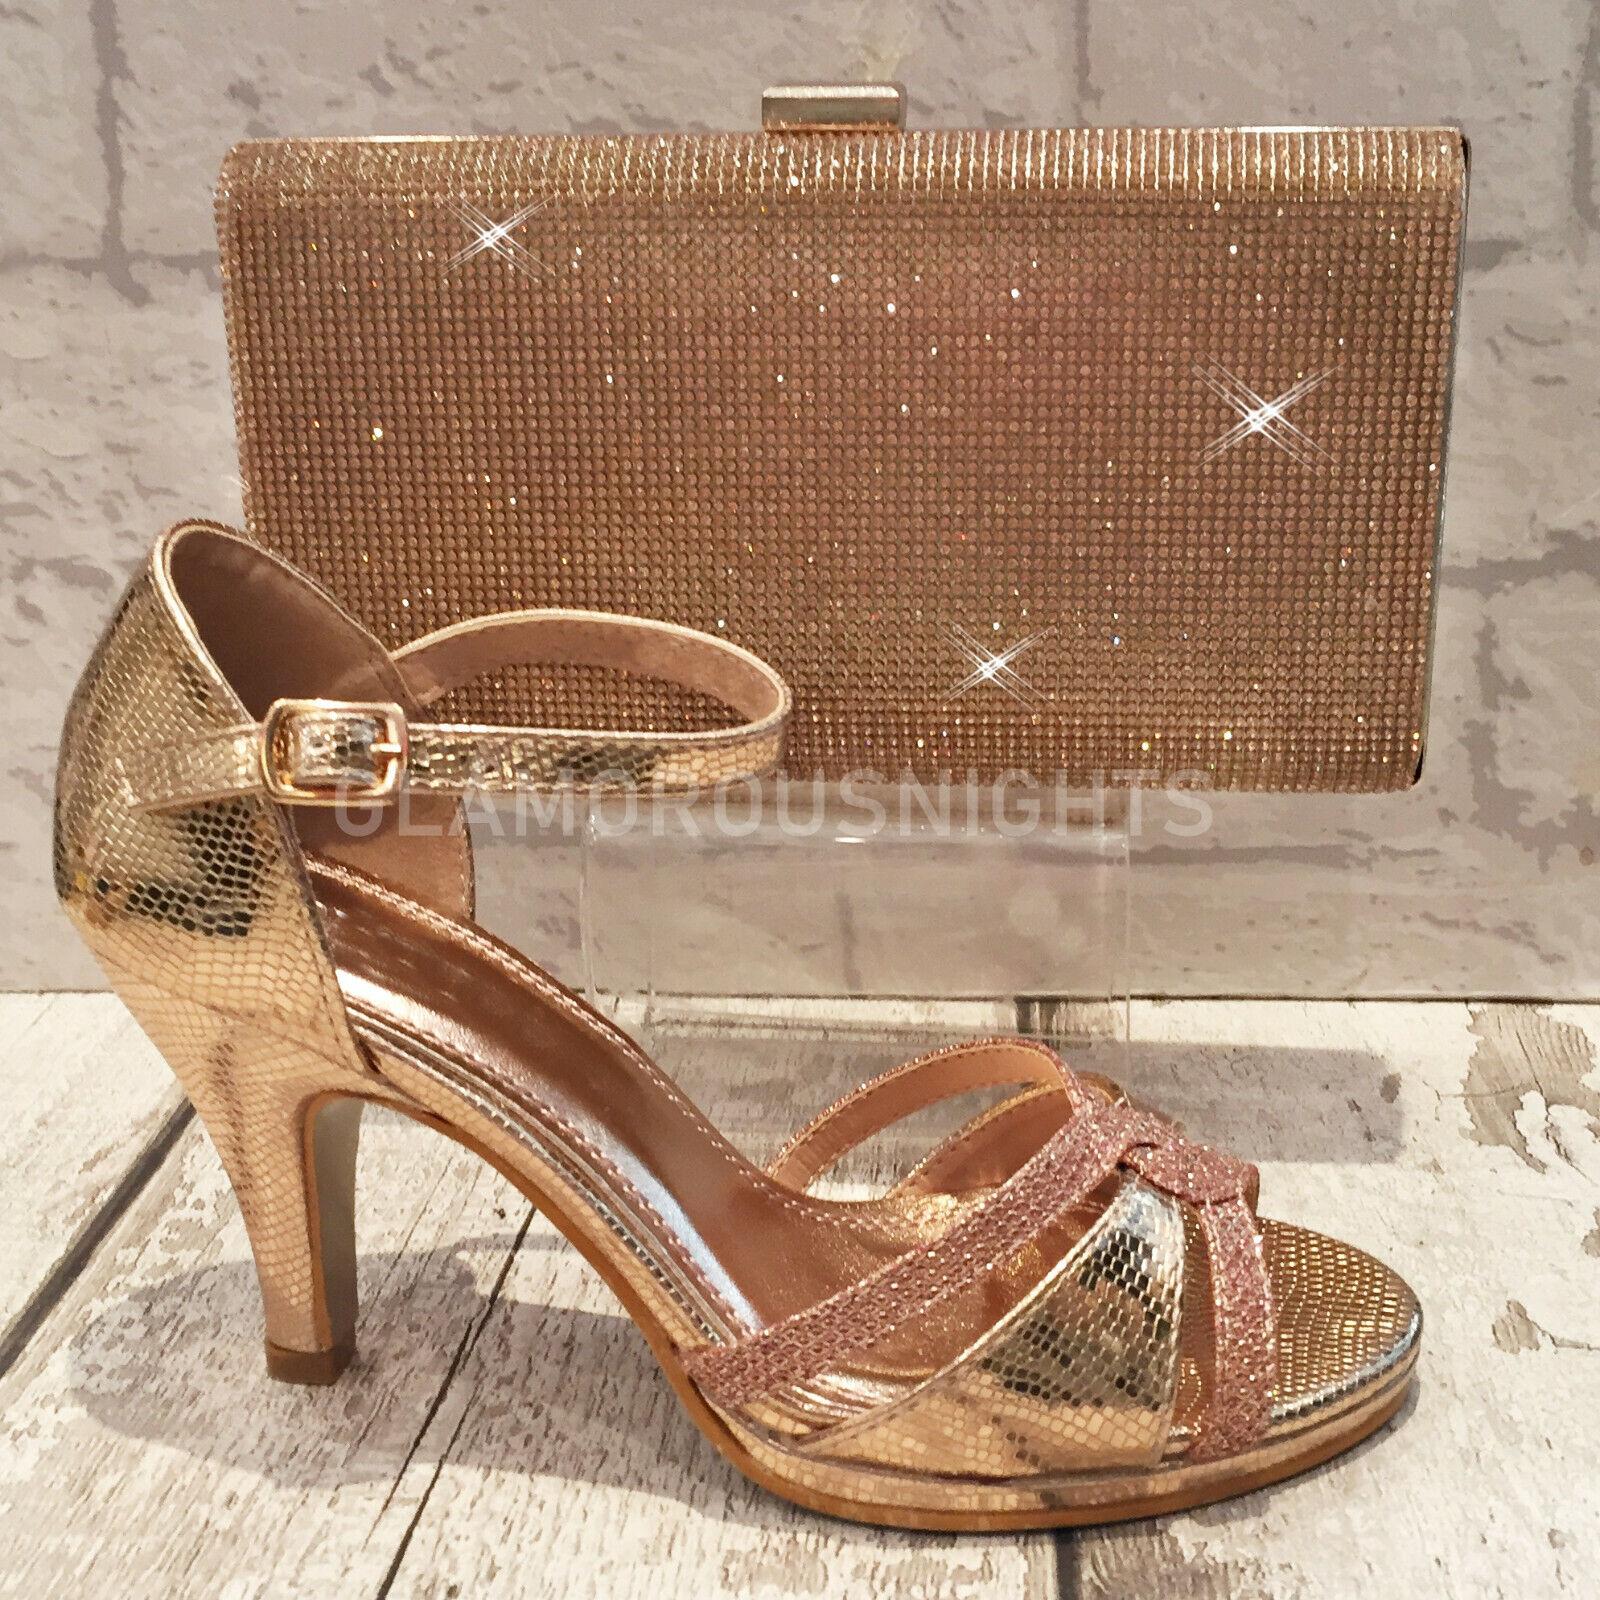 Ladies Black Shoes High Heel Sparkly Diamante Strappy Peep Toe Evening Sandal